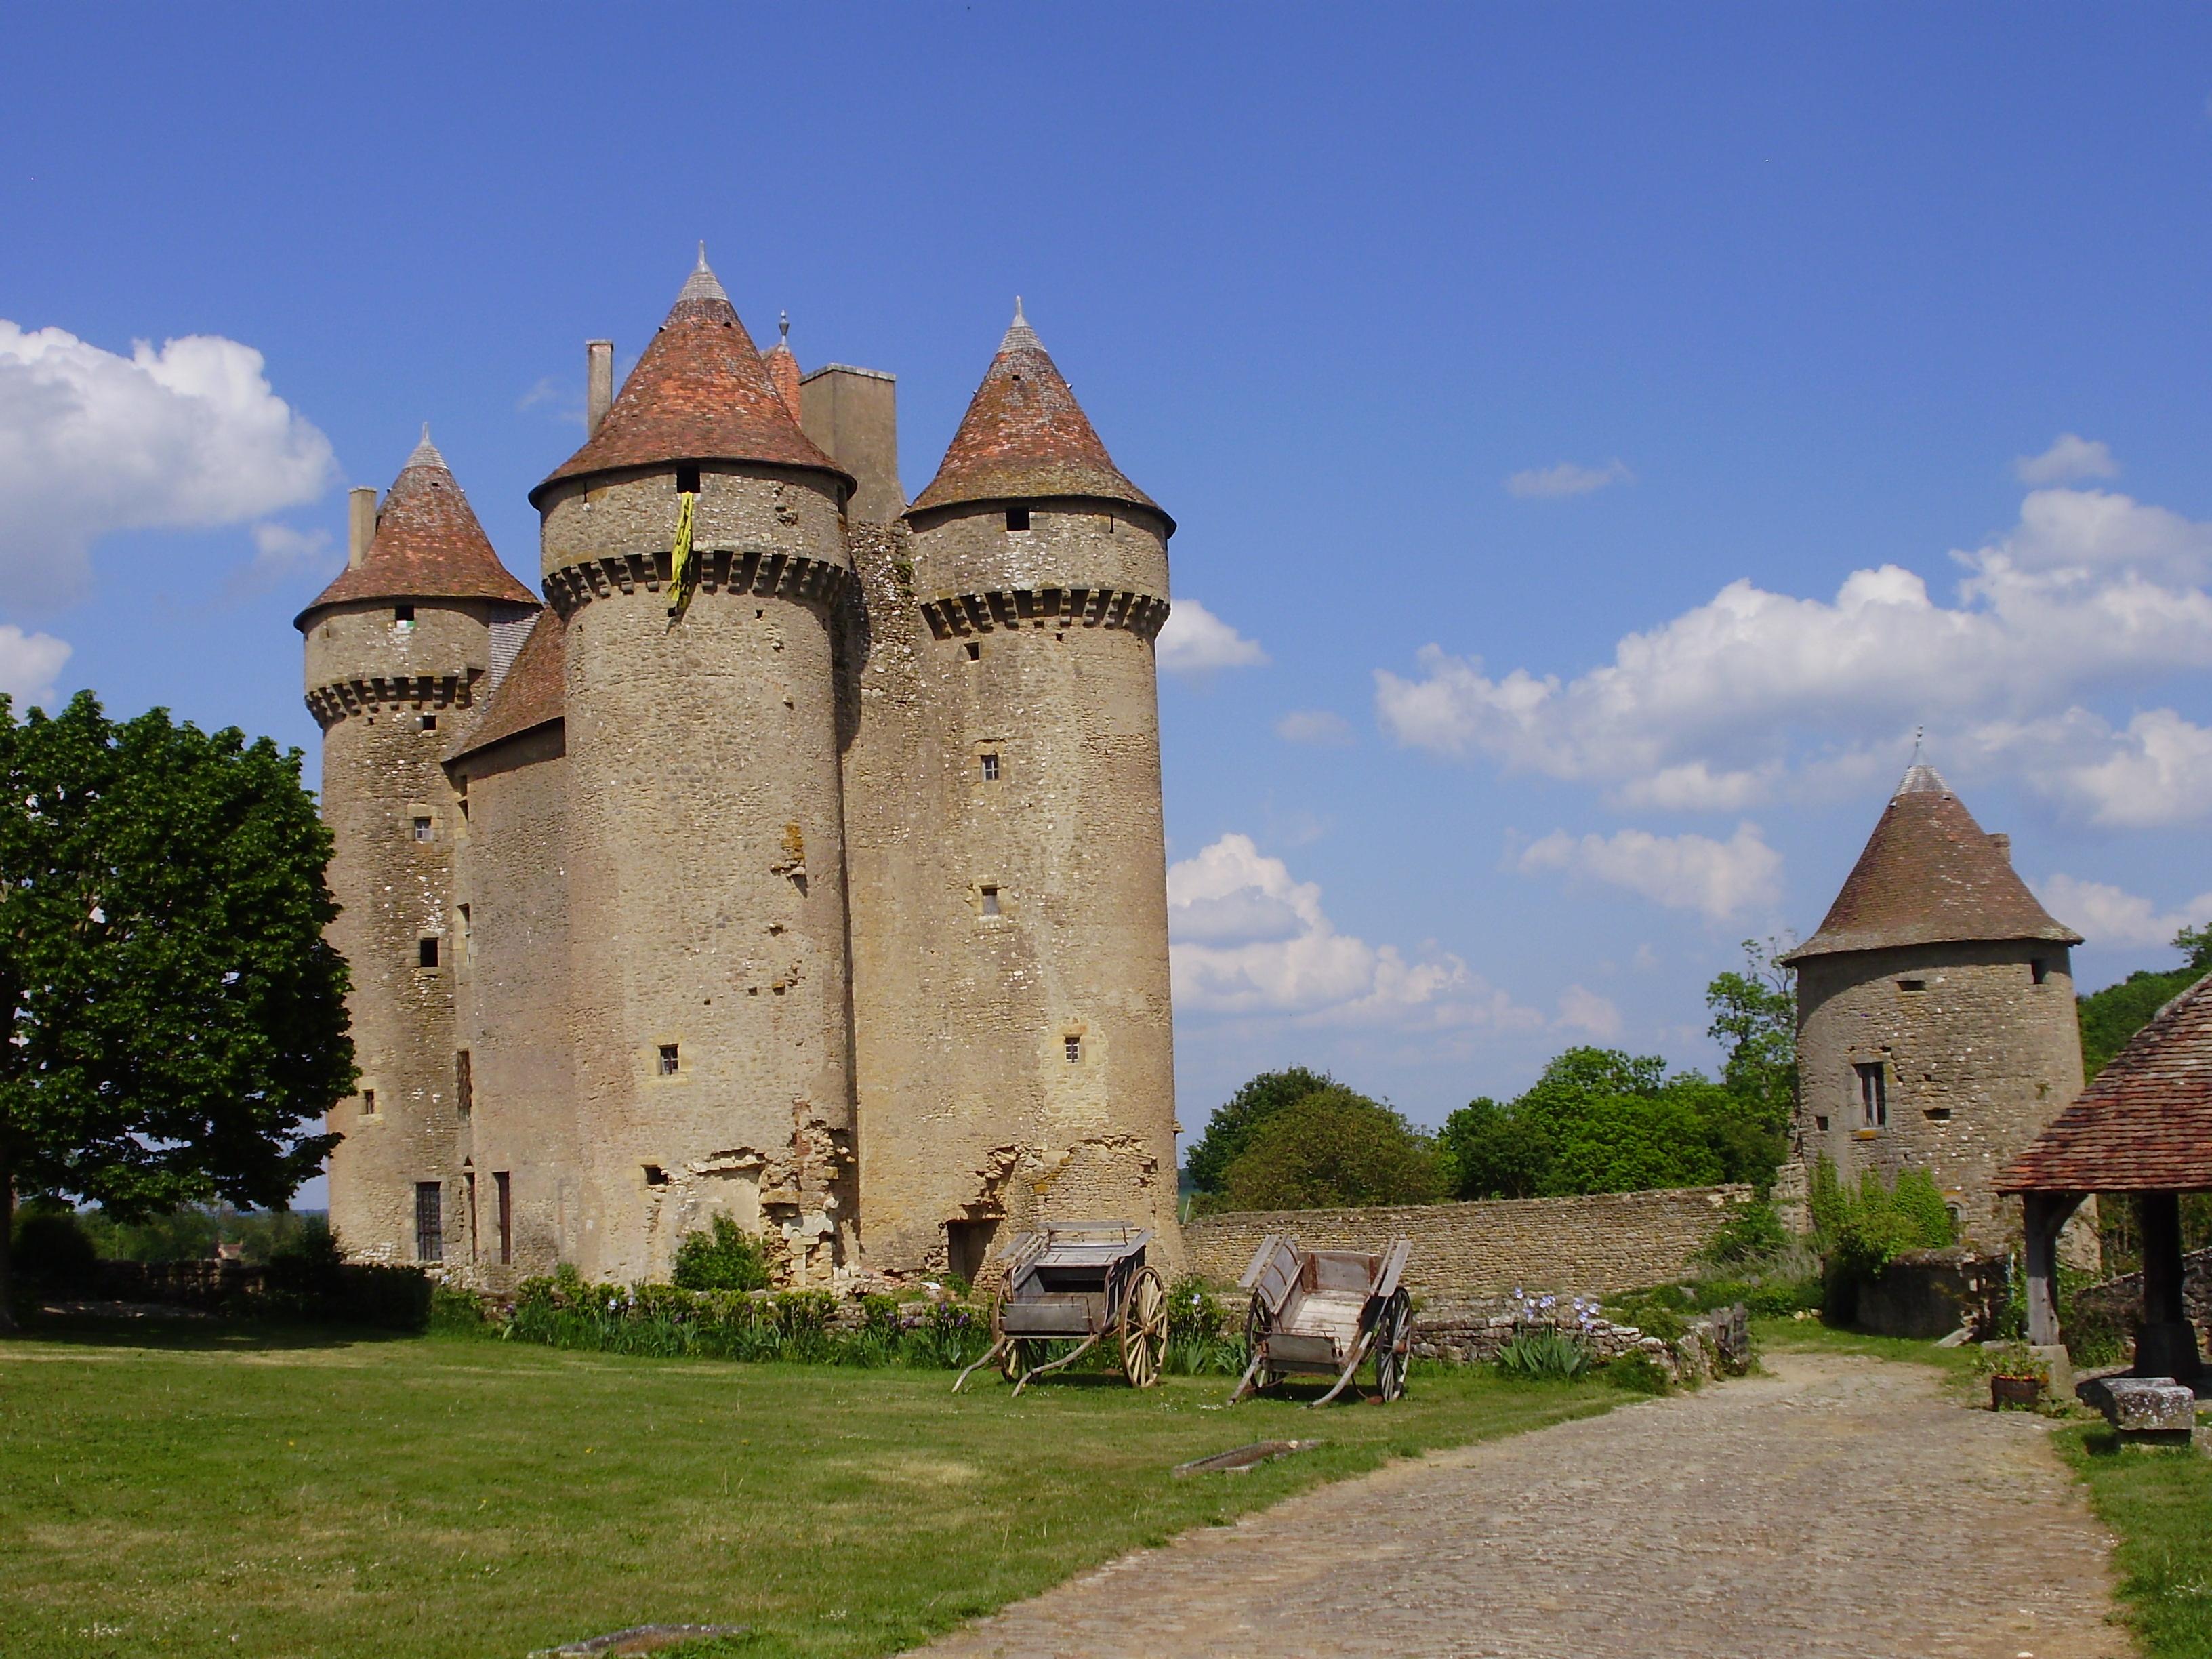 911-chateau_de_sarzay-indre.jpg